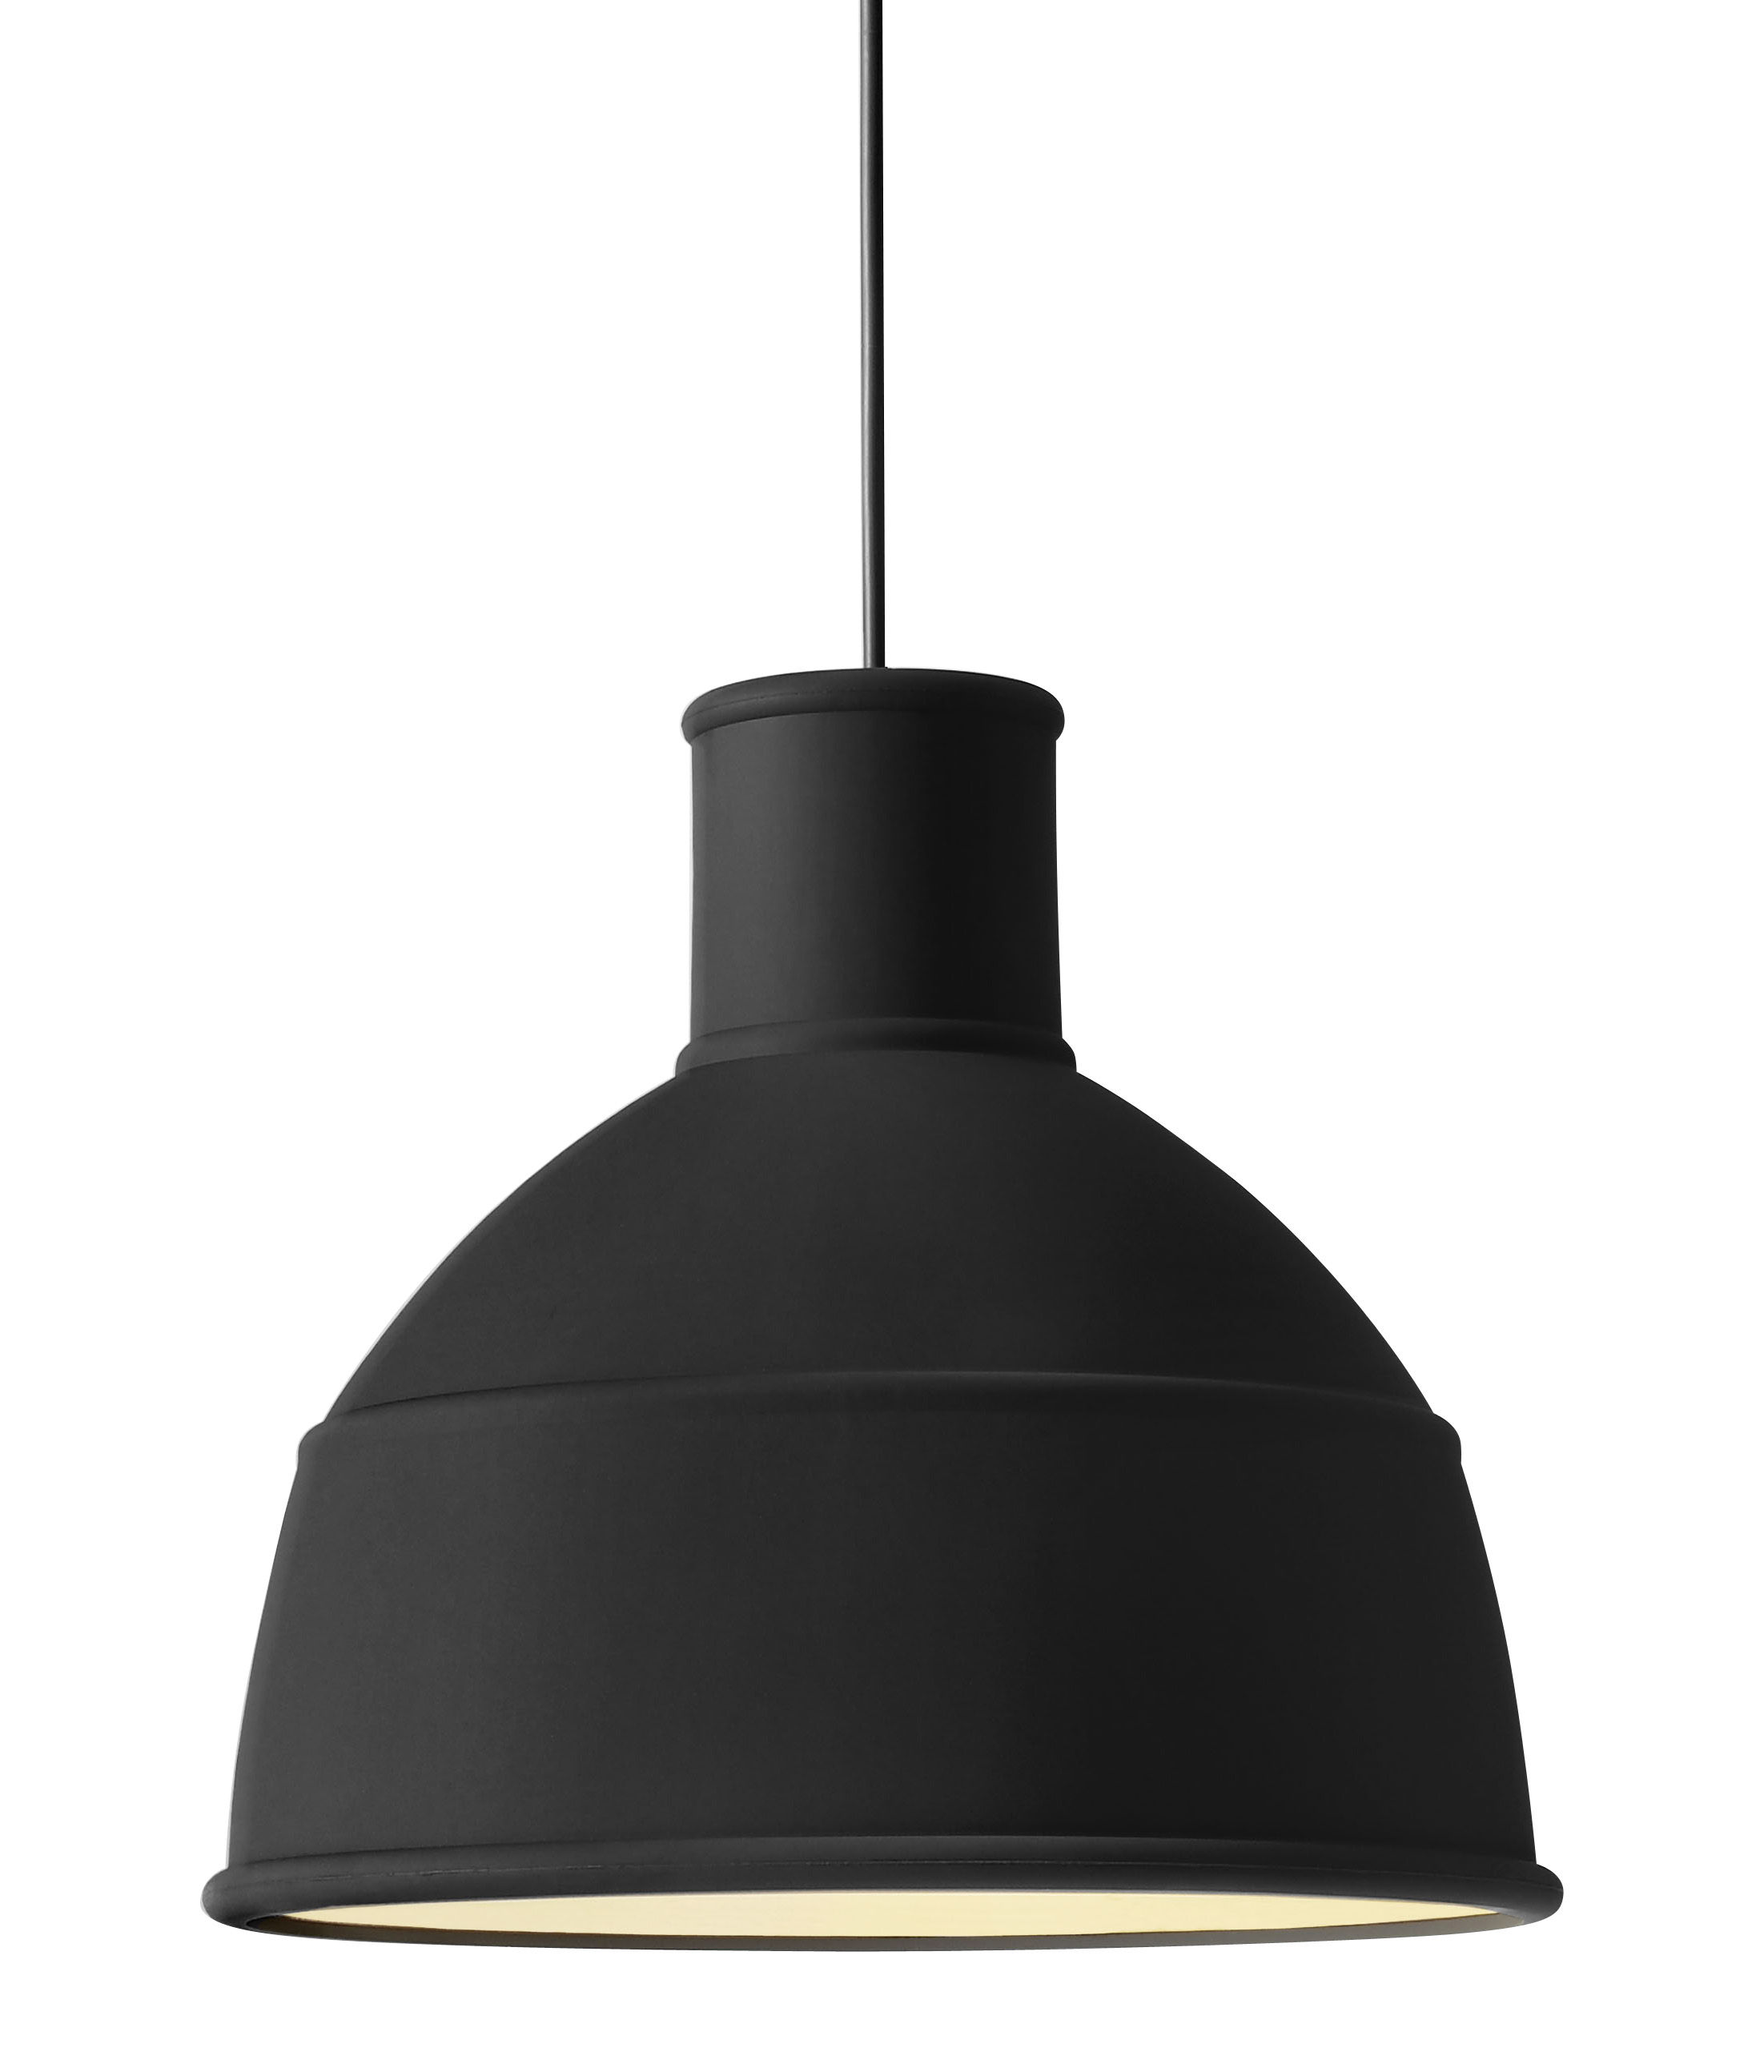 suspension unfold en silicone noir muuto. Black Bedroom Furniture Sets. Home Design Ideas